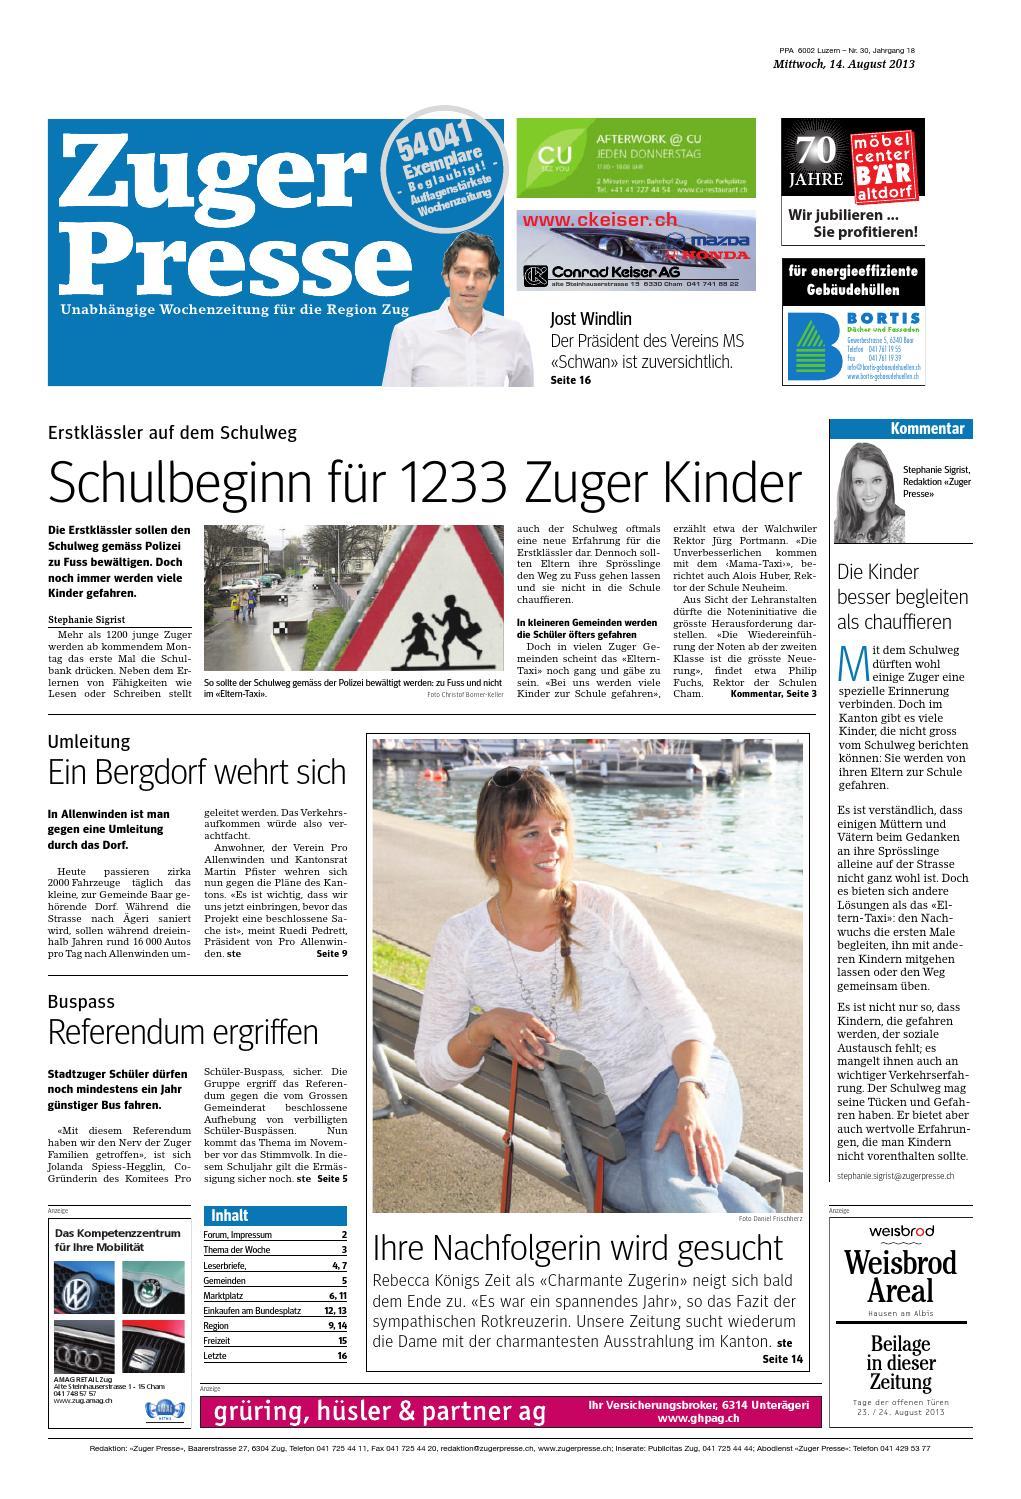 Zuger presse 20130814 by Zuger Presse - Zugerbieter - issuu